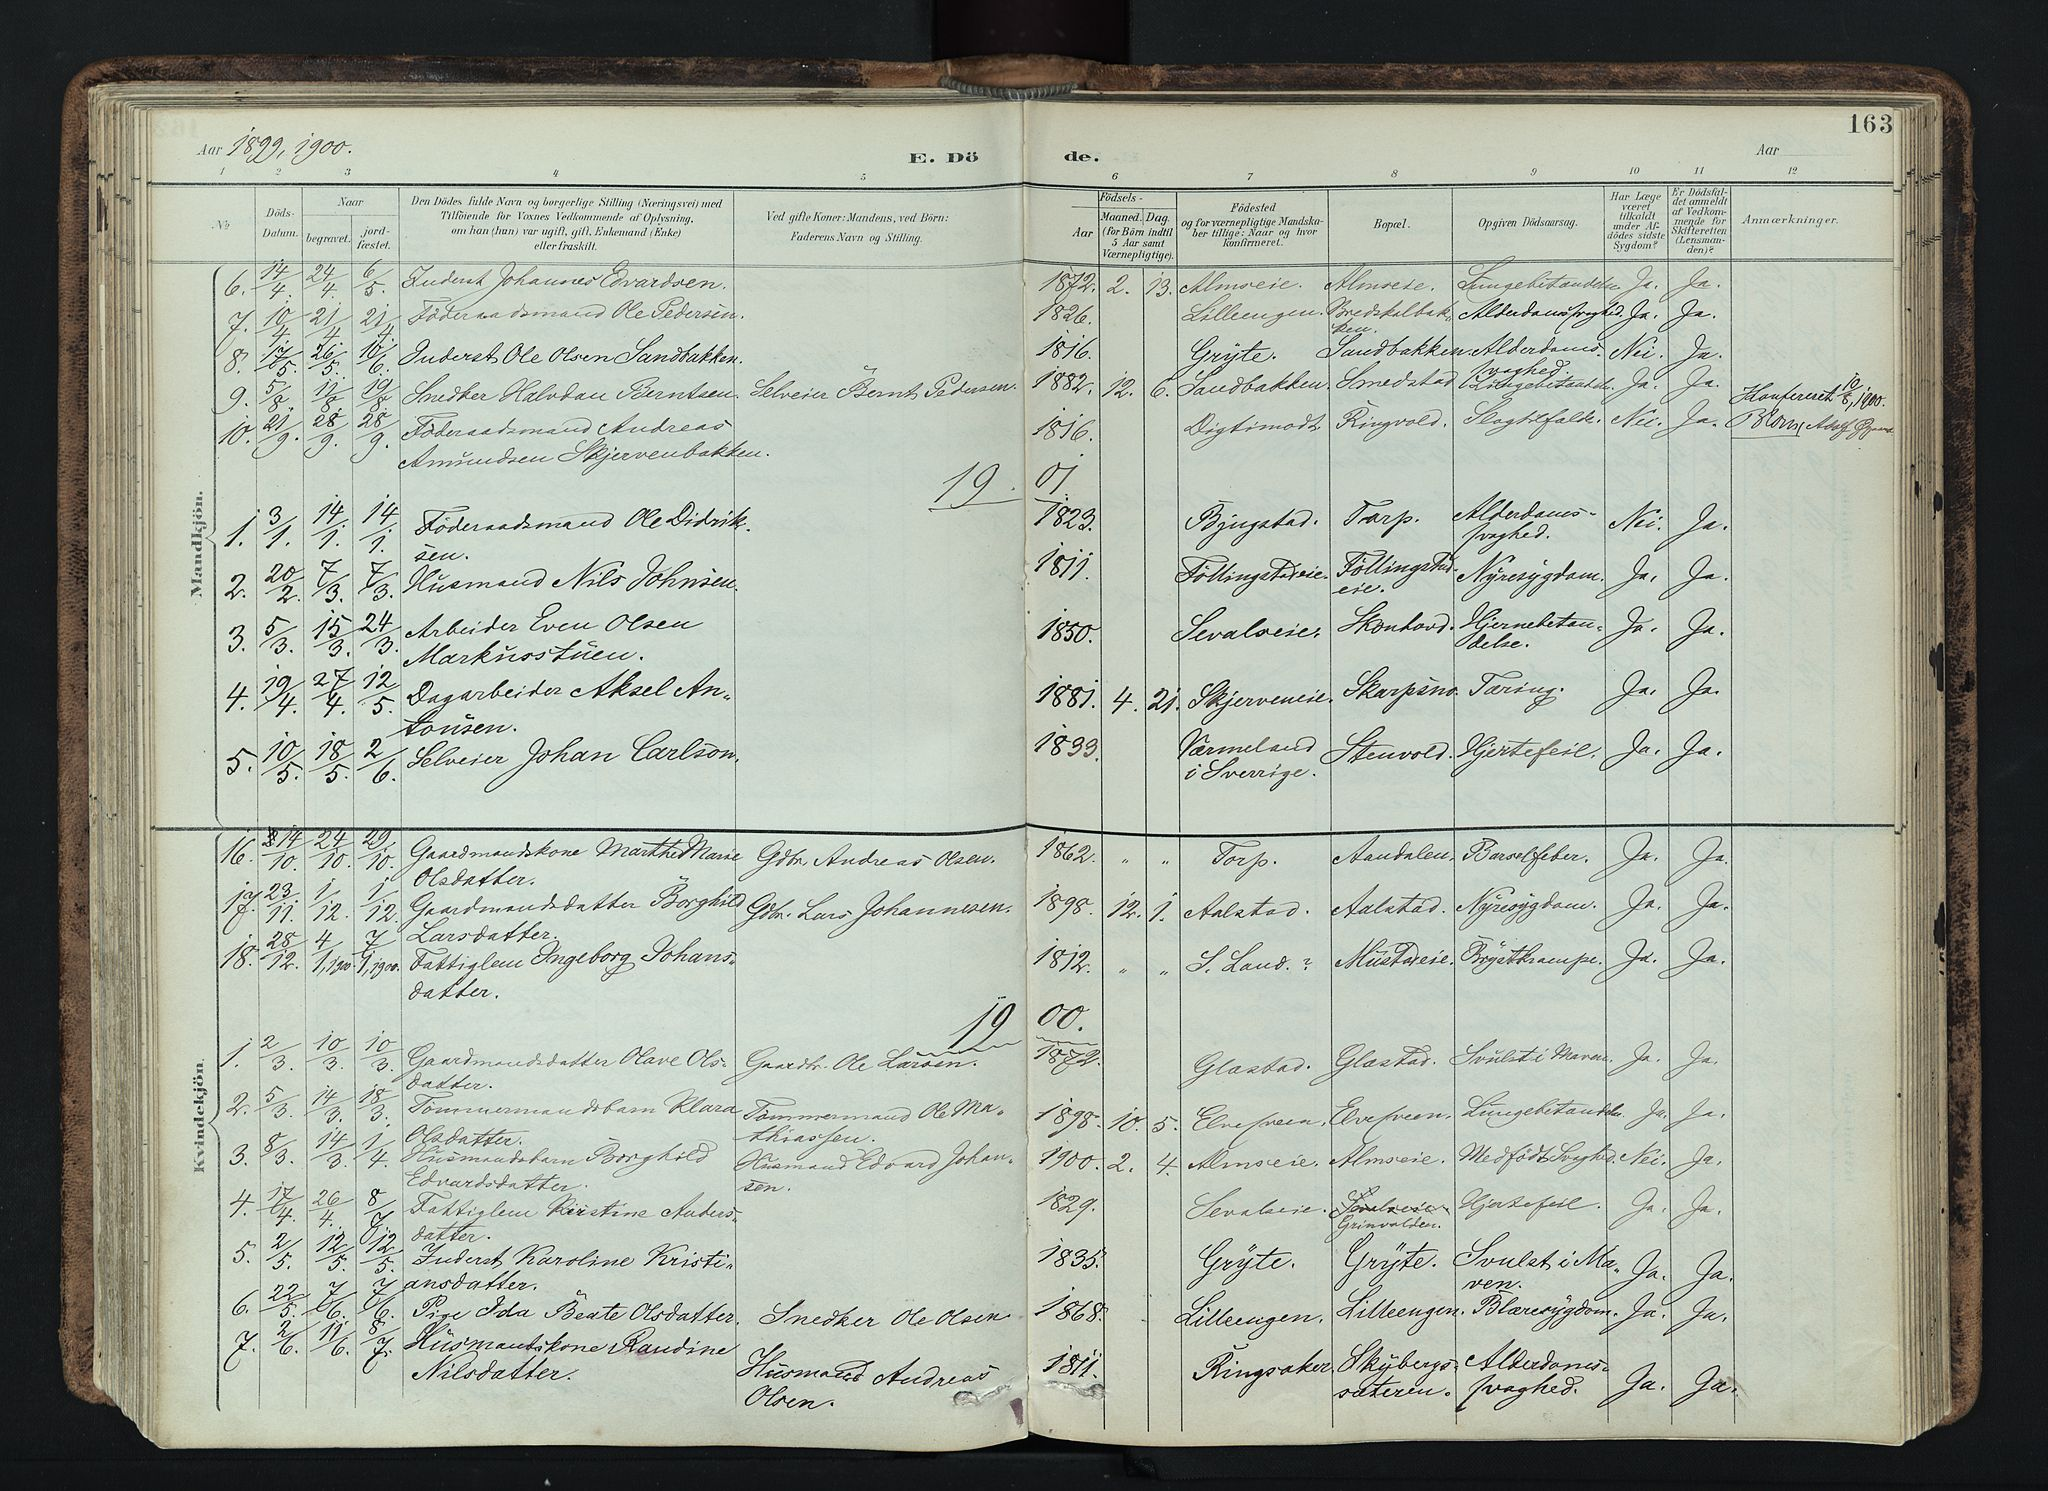 SAH, Vardal prestekontor, H/Ha/Haa/L0019: Ministerialbok nr. 19, 1893-1907, s. 163